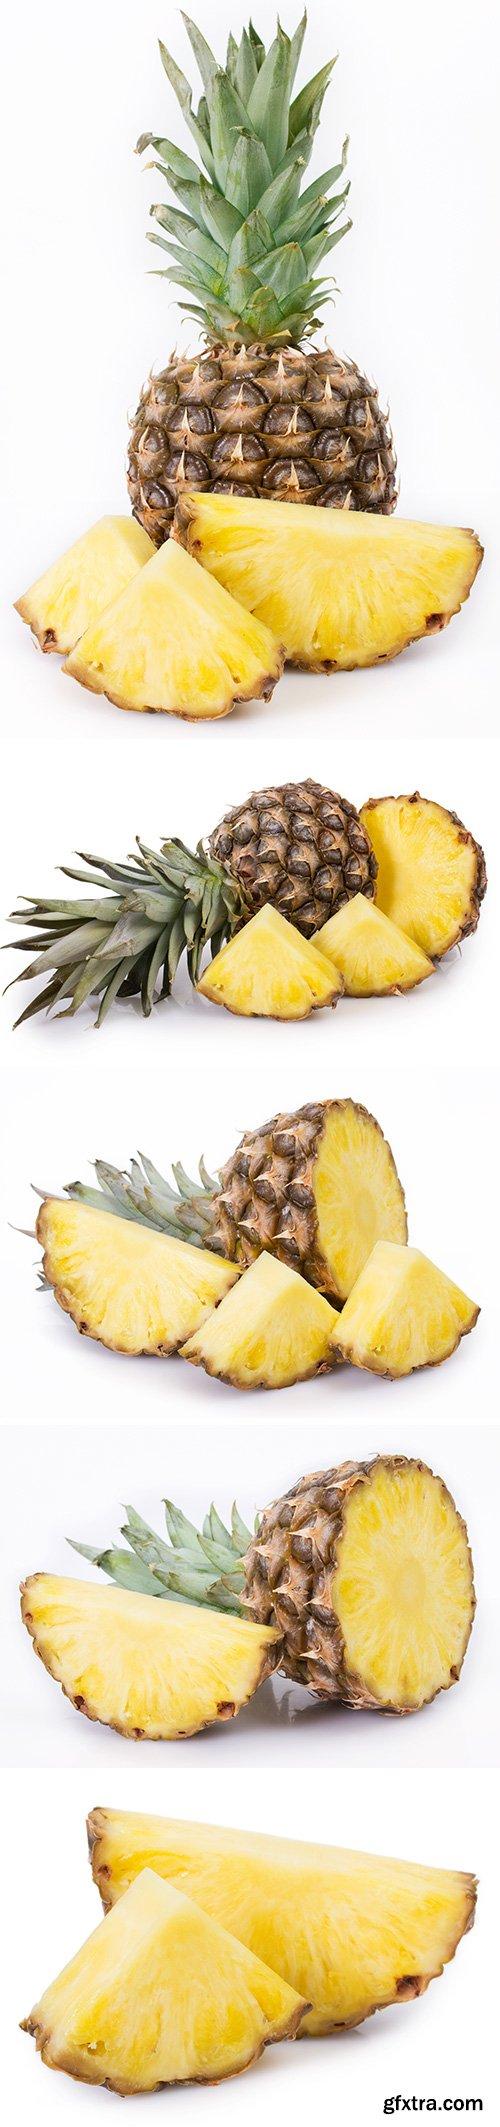 Pineapple Isolated - 10xJPGs